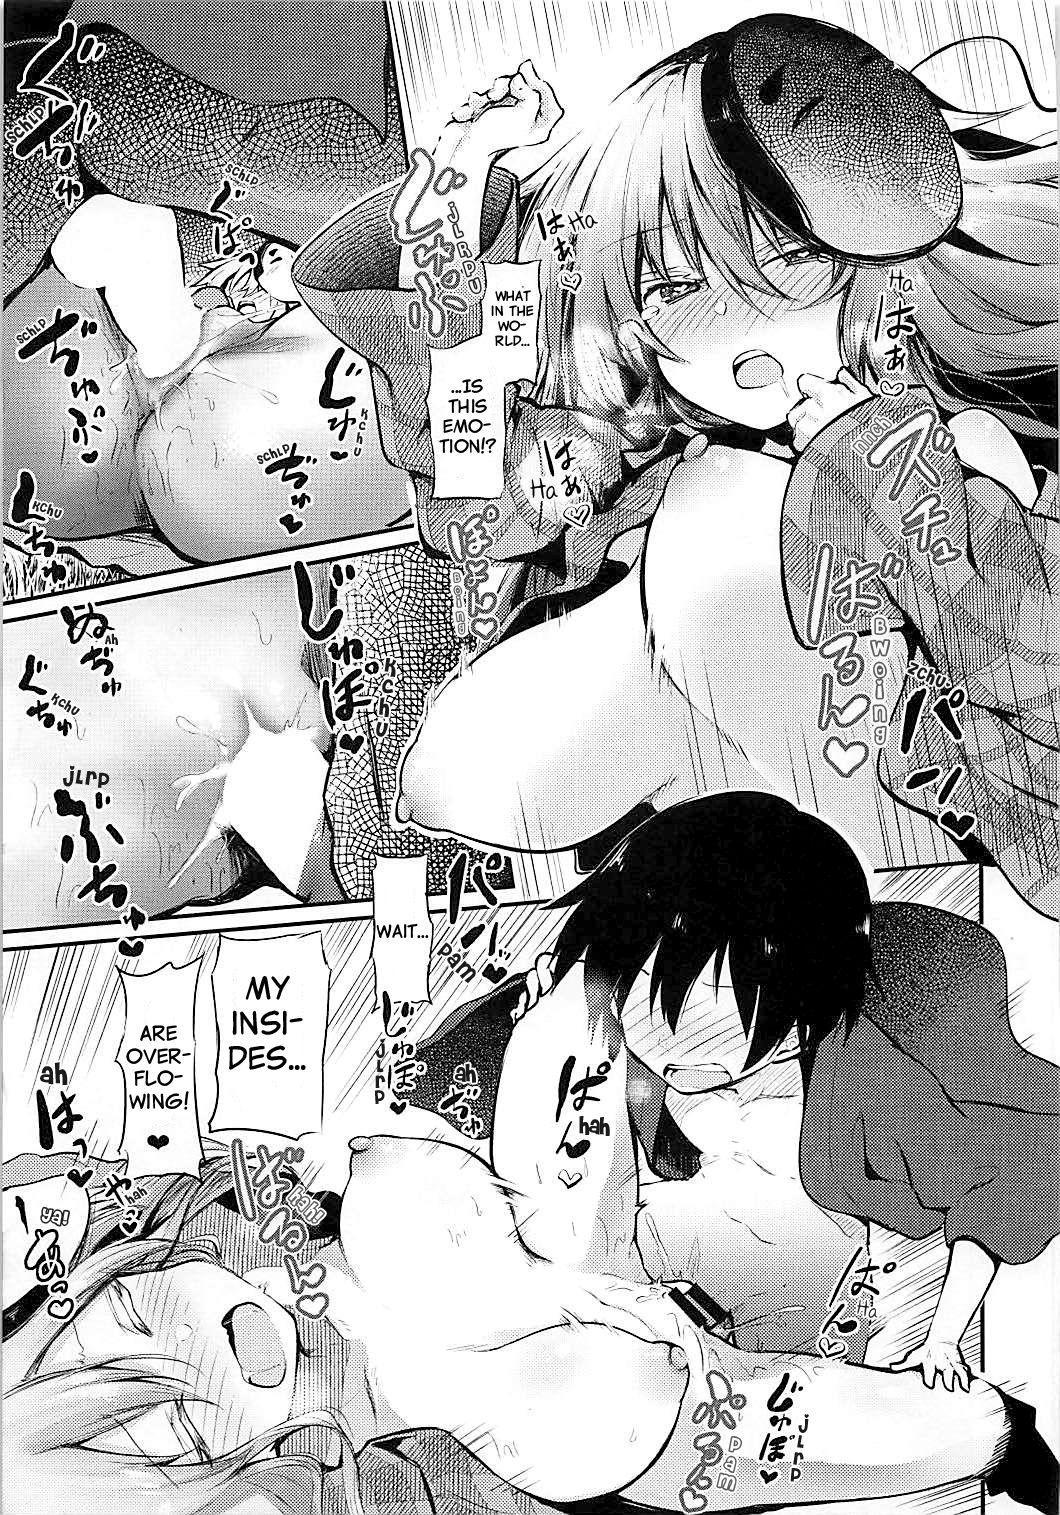 (Reitaisai 15) [Arutana (Chipa)] Kokoro Onee-chan to H na Obenkyou   Study-Time with Kokoro Onee-chan (Touhou Project) [English] [Mister lol] 16